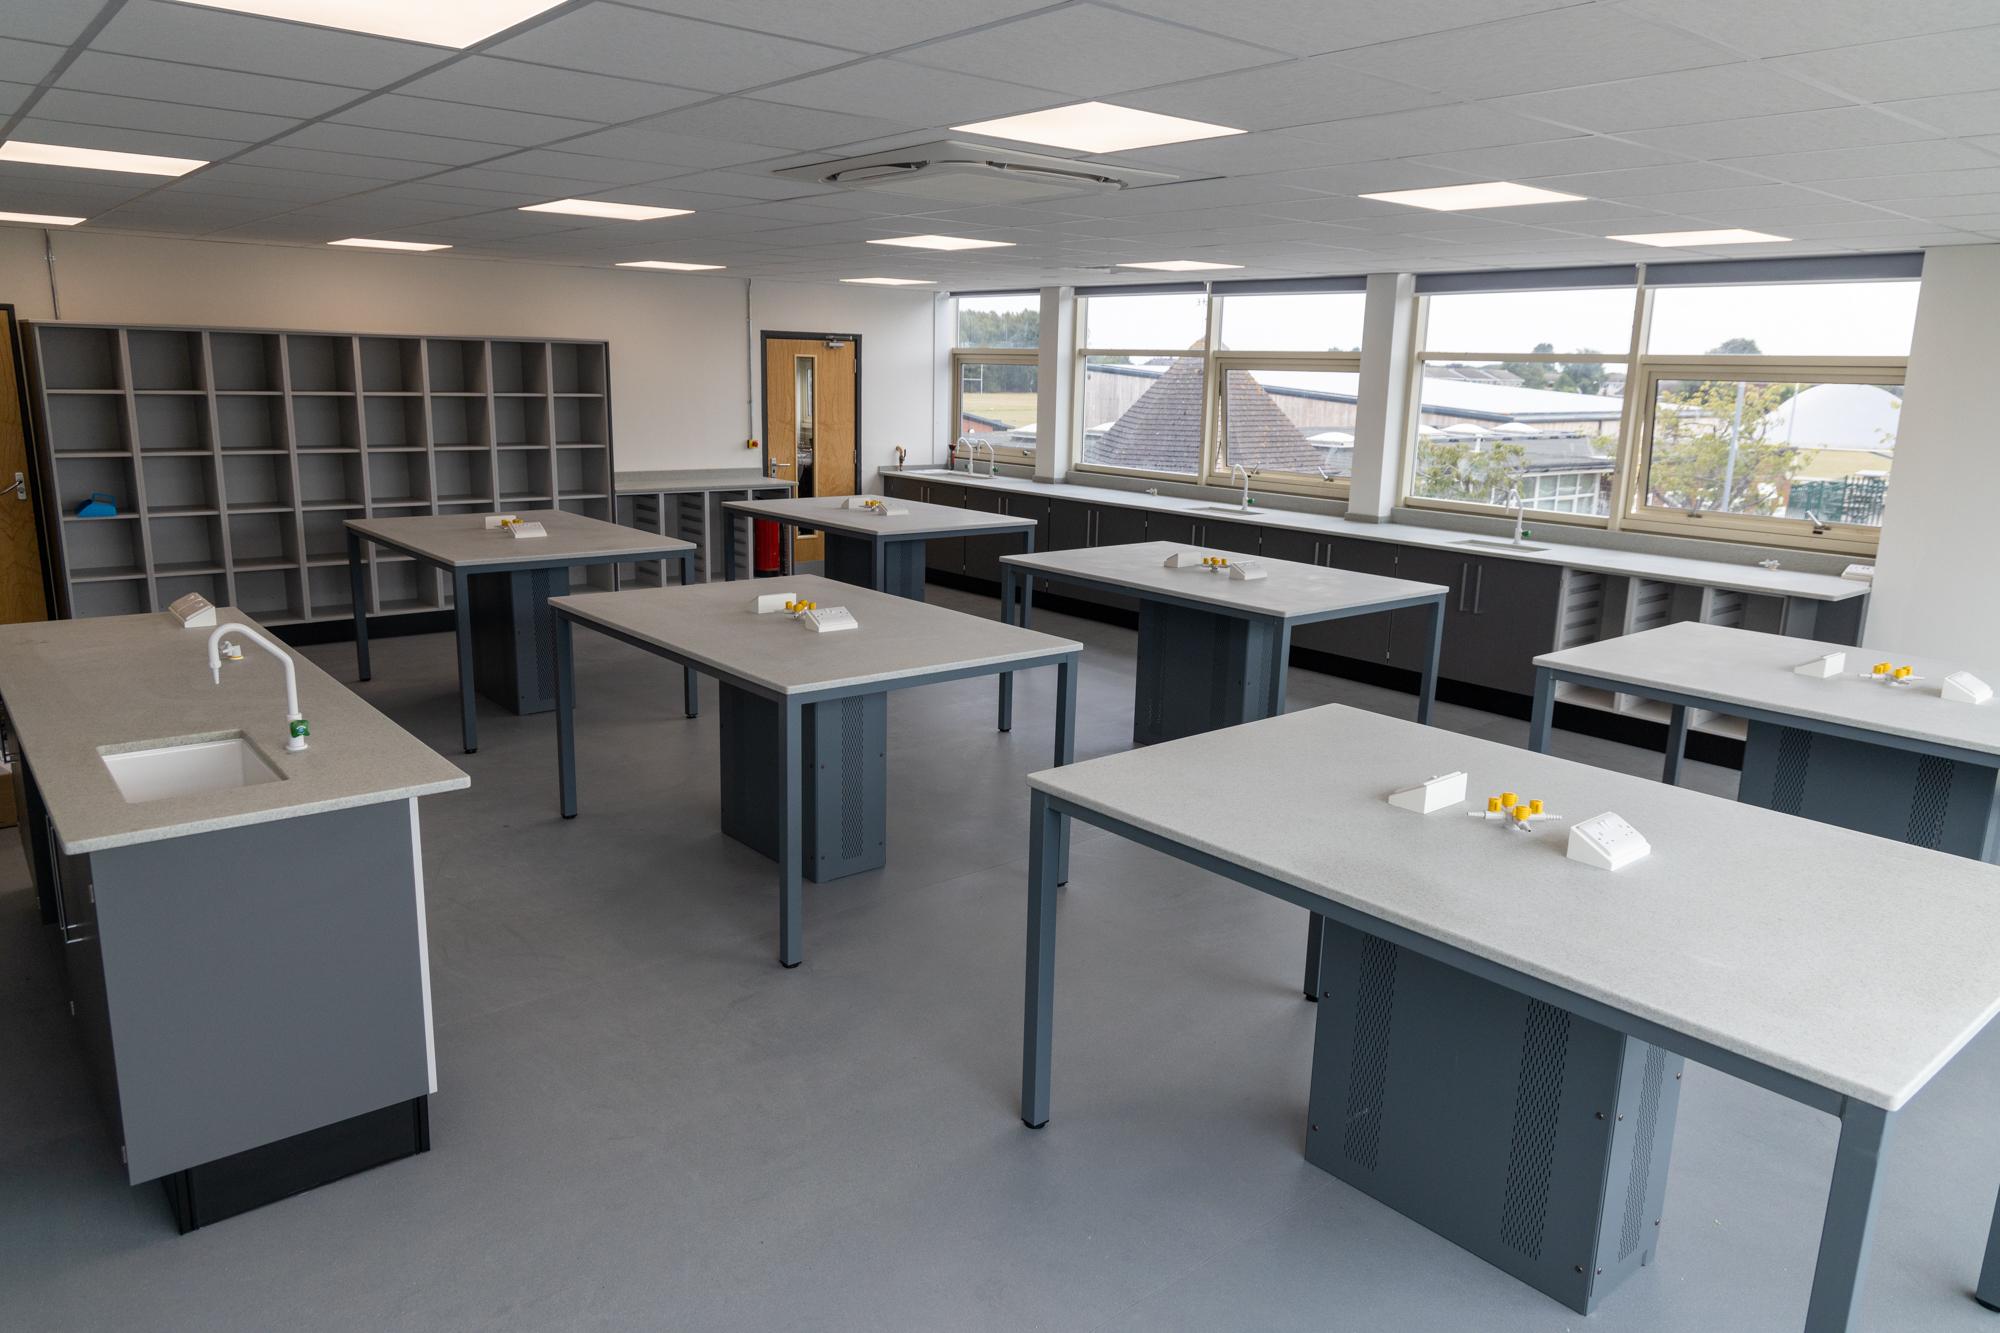 Shield Education Refurbishment